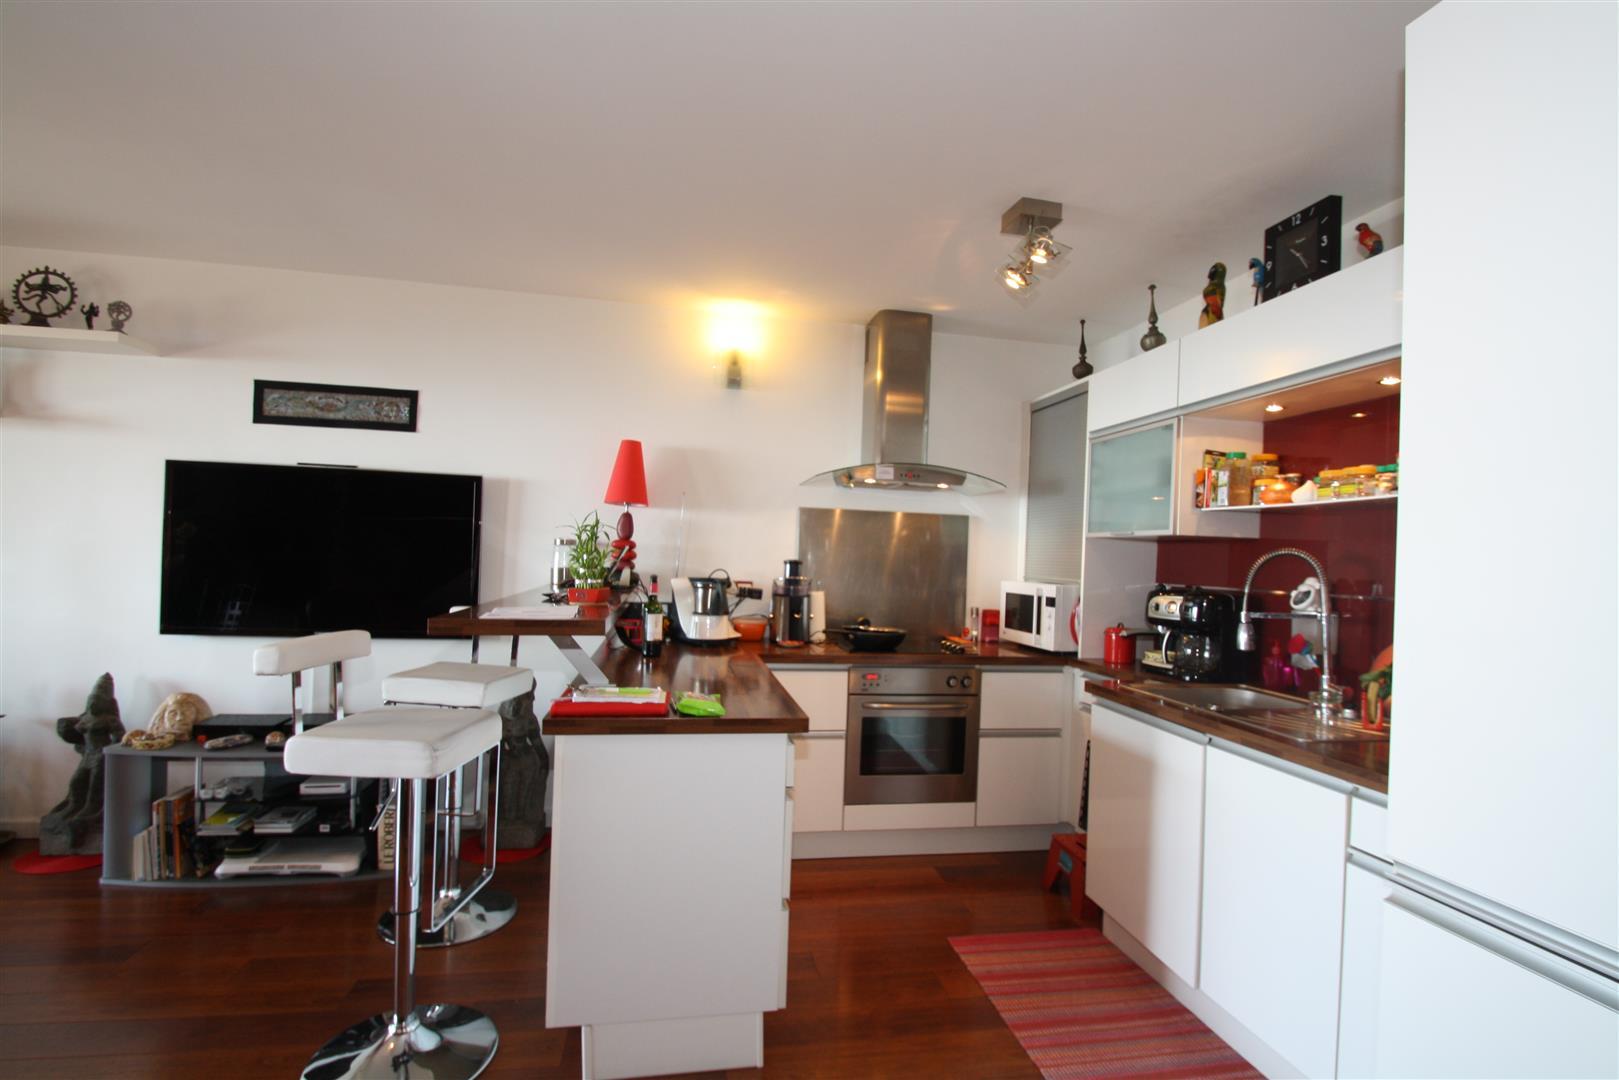 cuine equipee bastia sud duplex agence immobili re bastia avec localisimmo agence. Black Bedroom Furniture Sets. Home Design Ideas